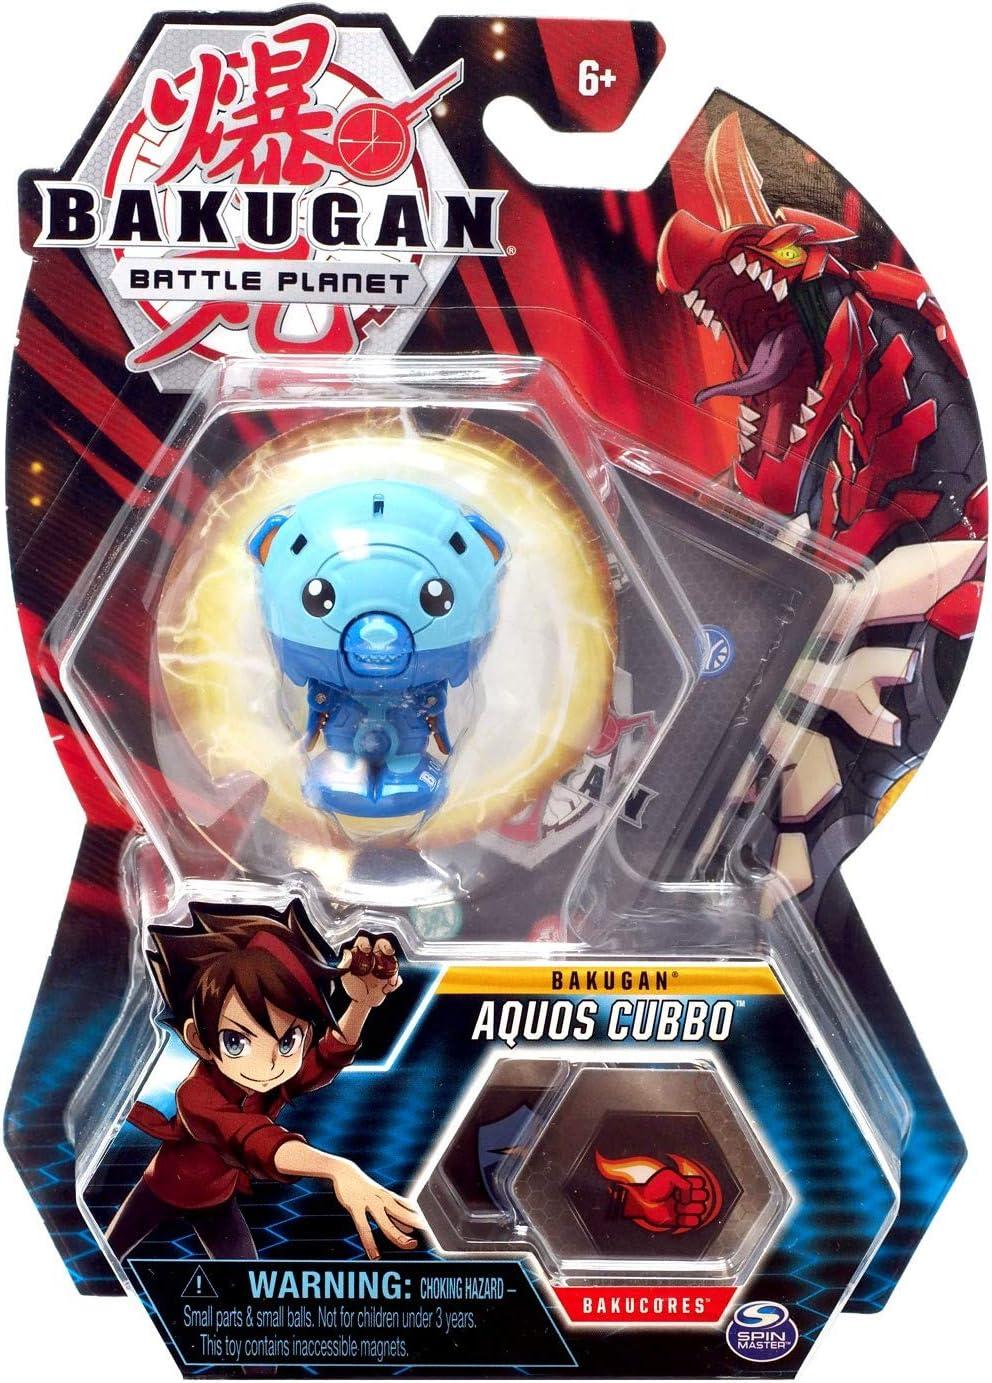 Bakugan, Aquos Cubbo, 2